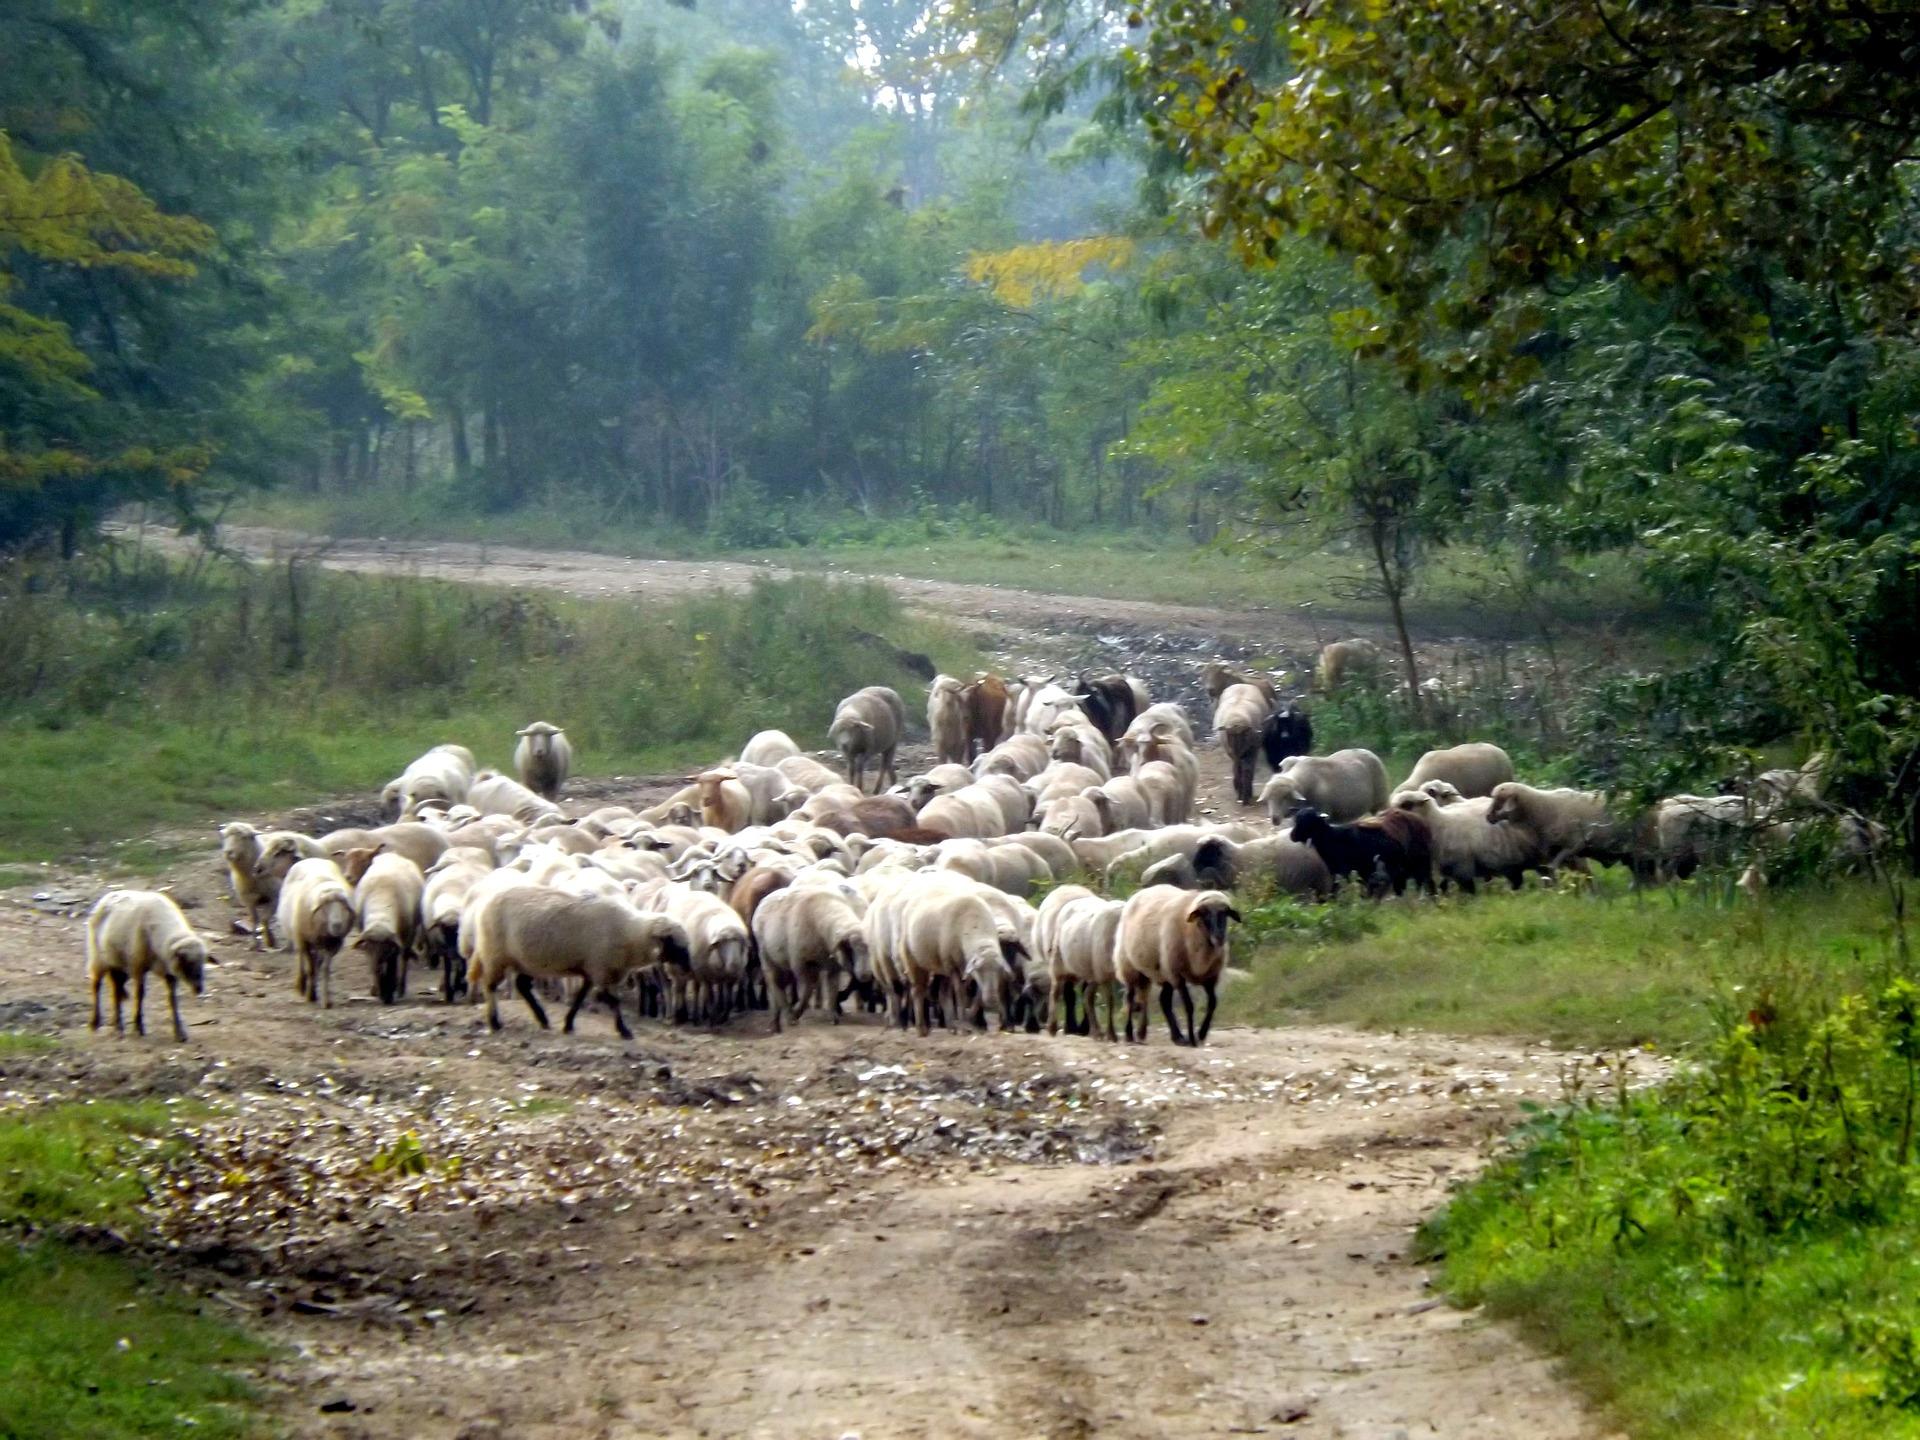 sheep-974762_1920